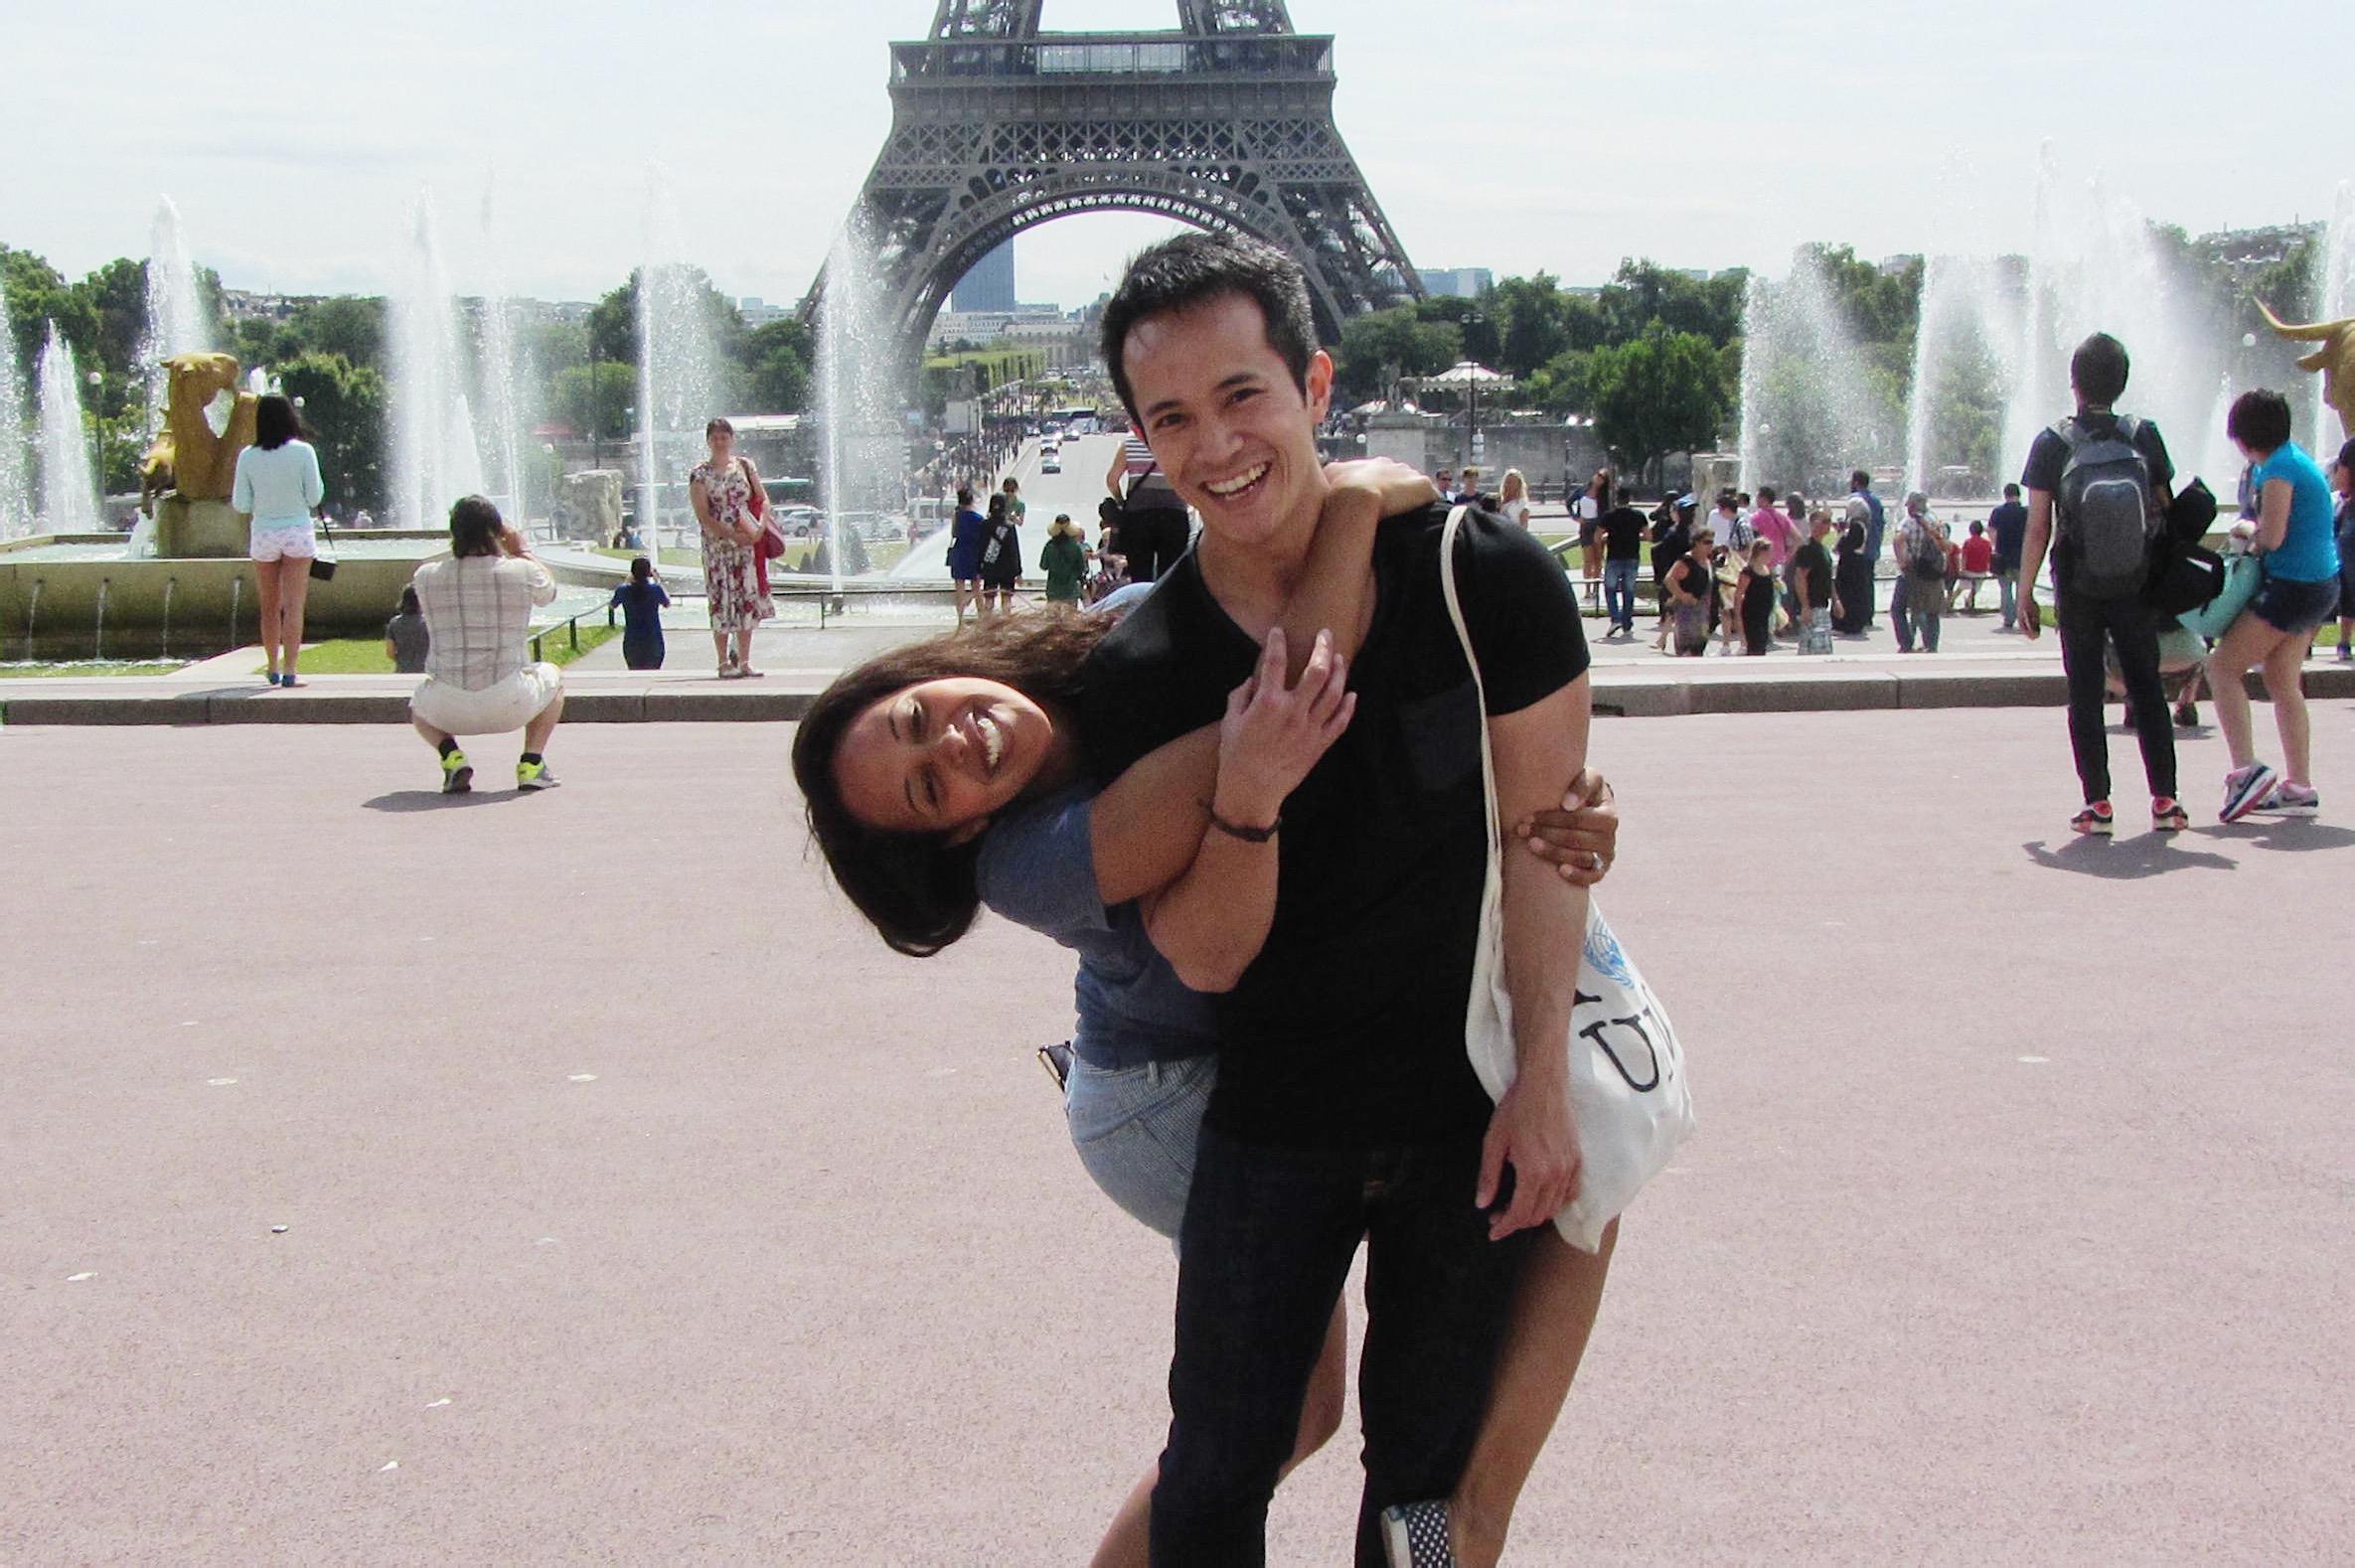 friends-by-the-Eiffel-Tower-Paris